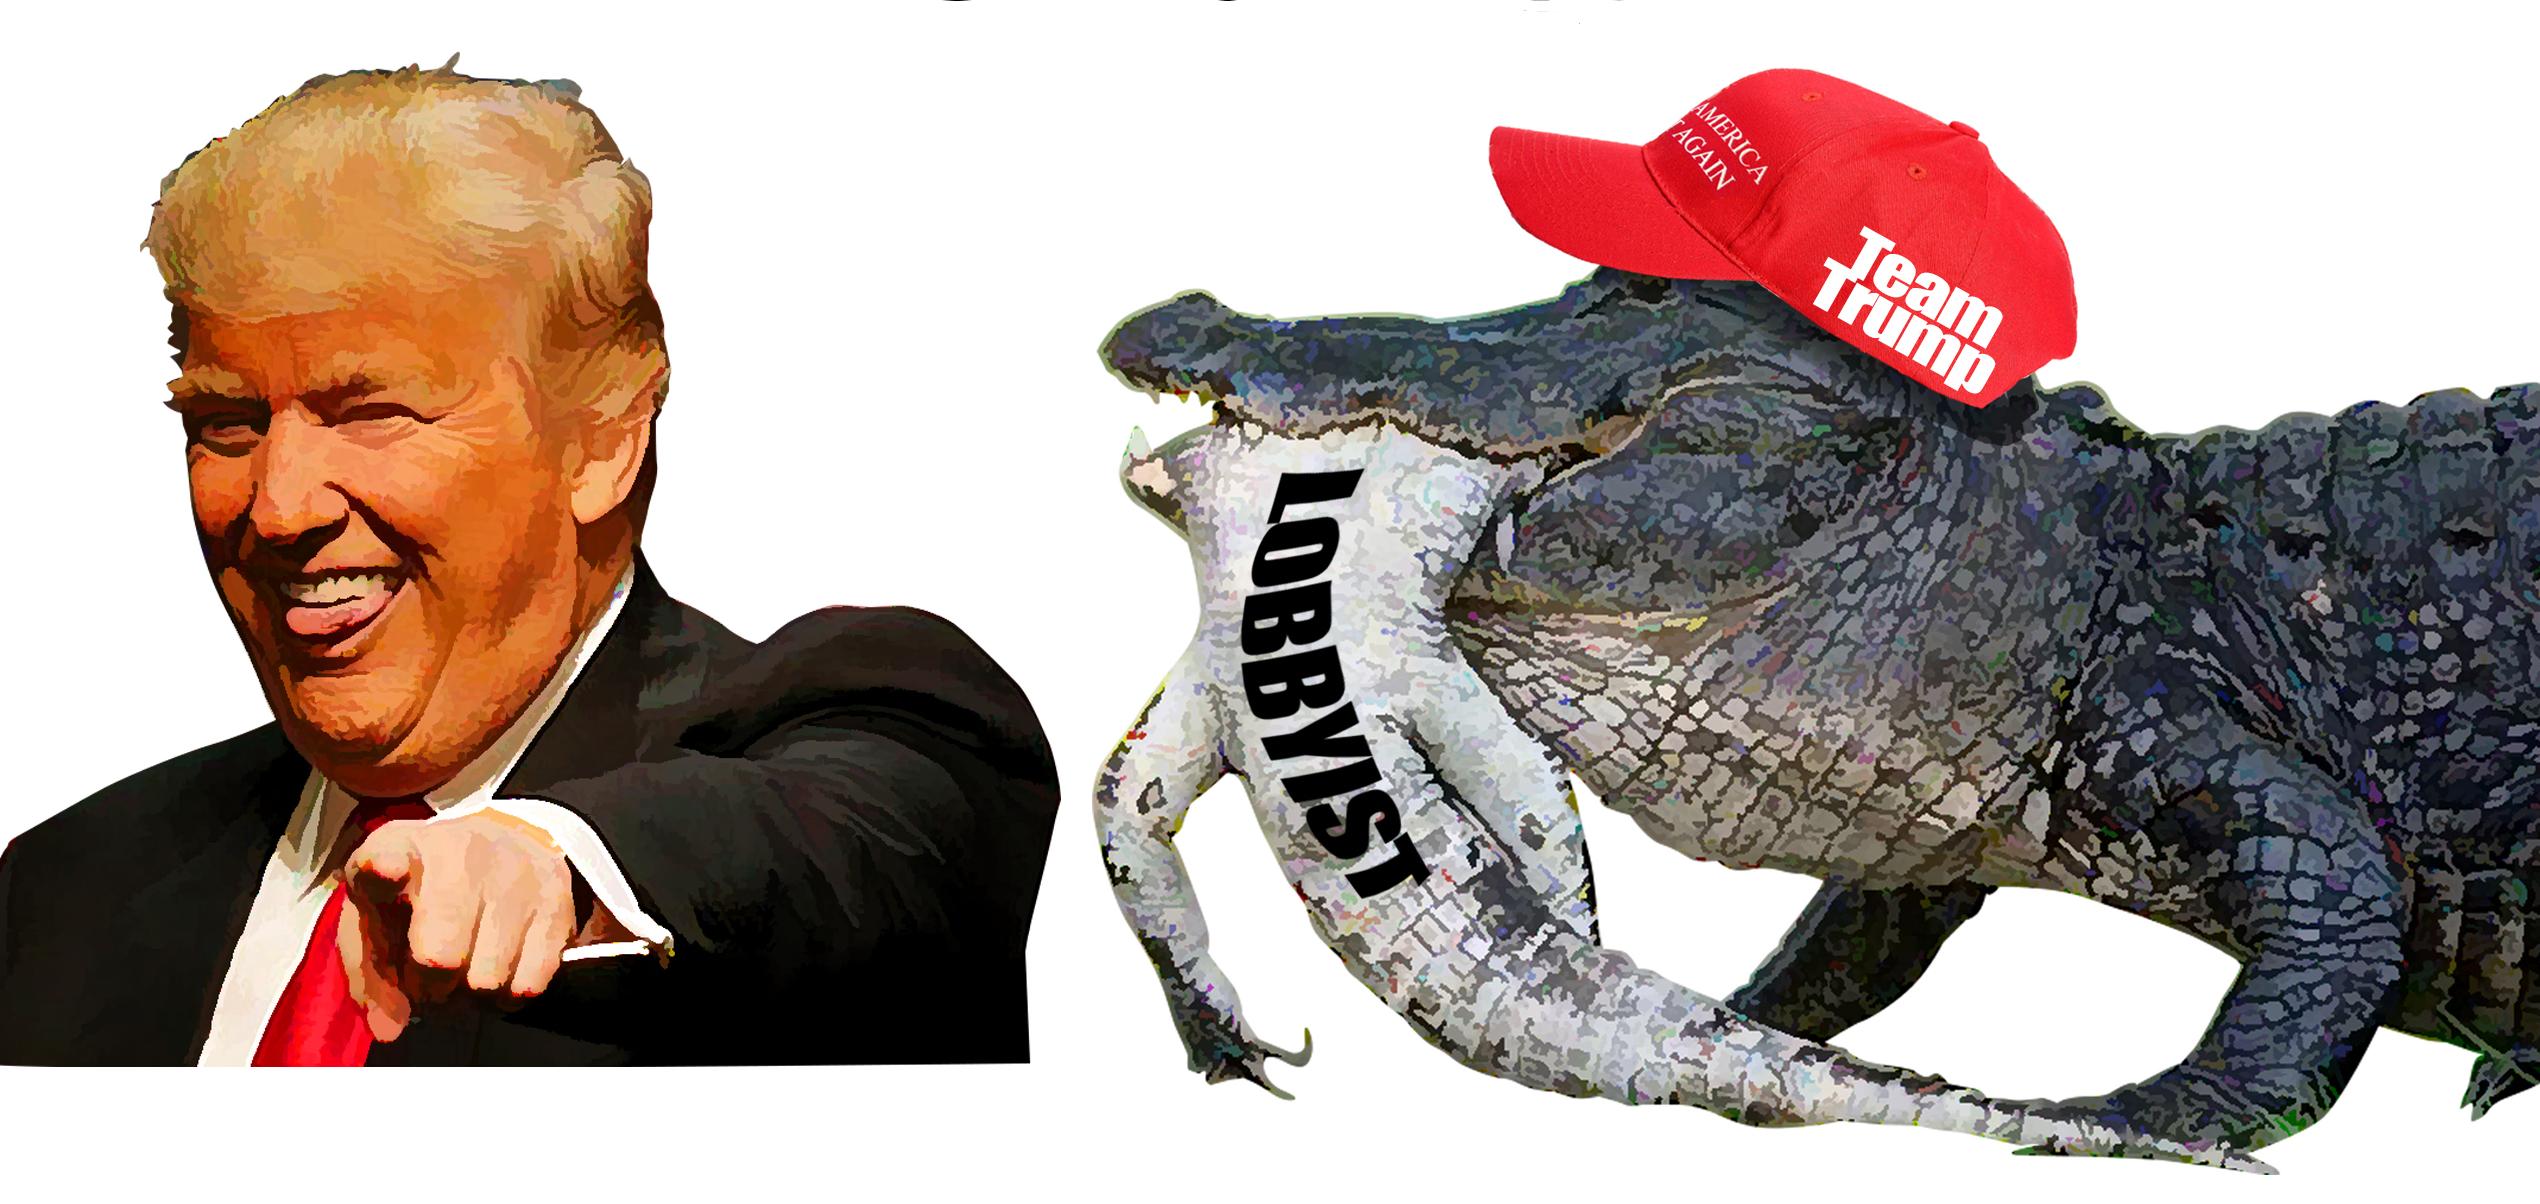 Trained aligator